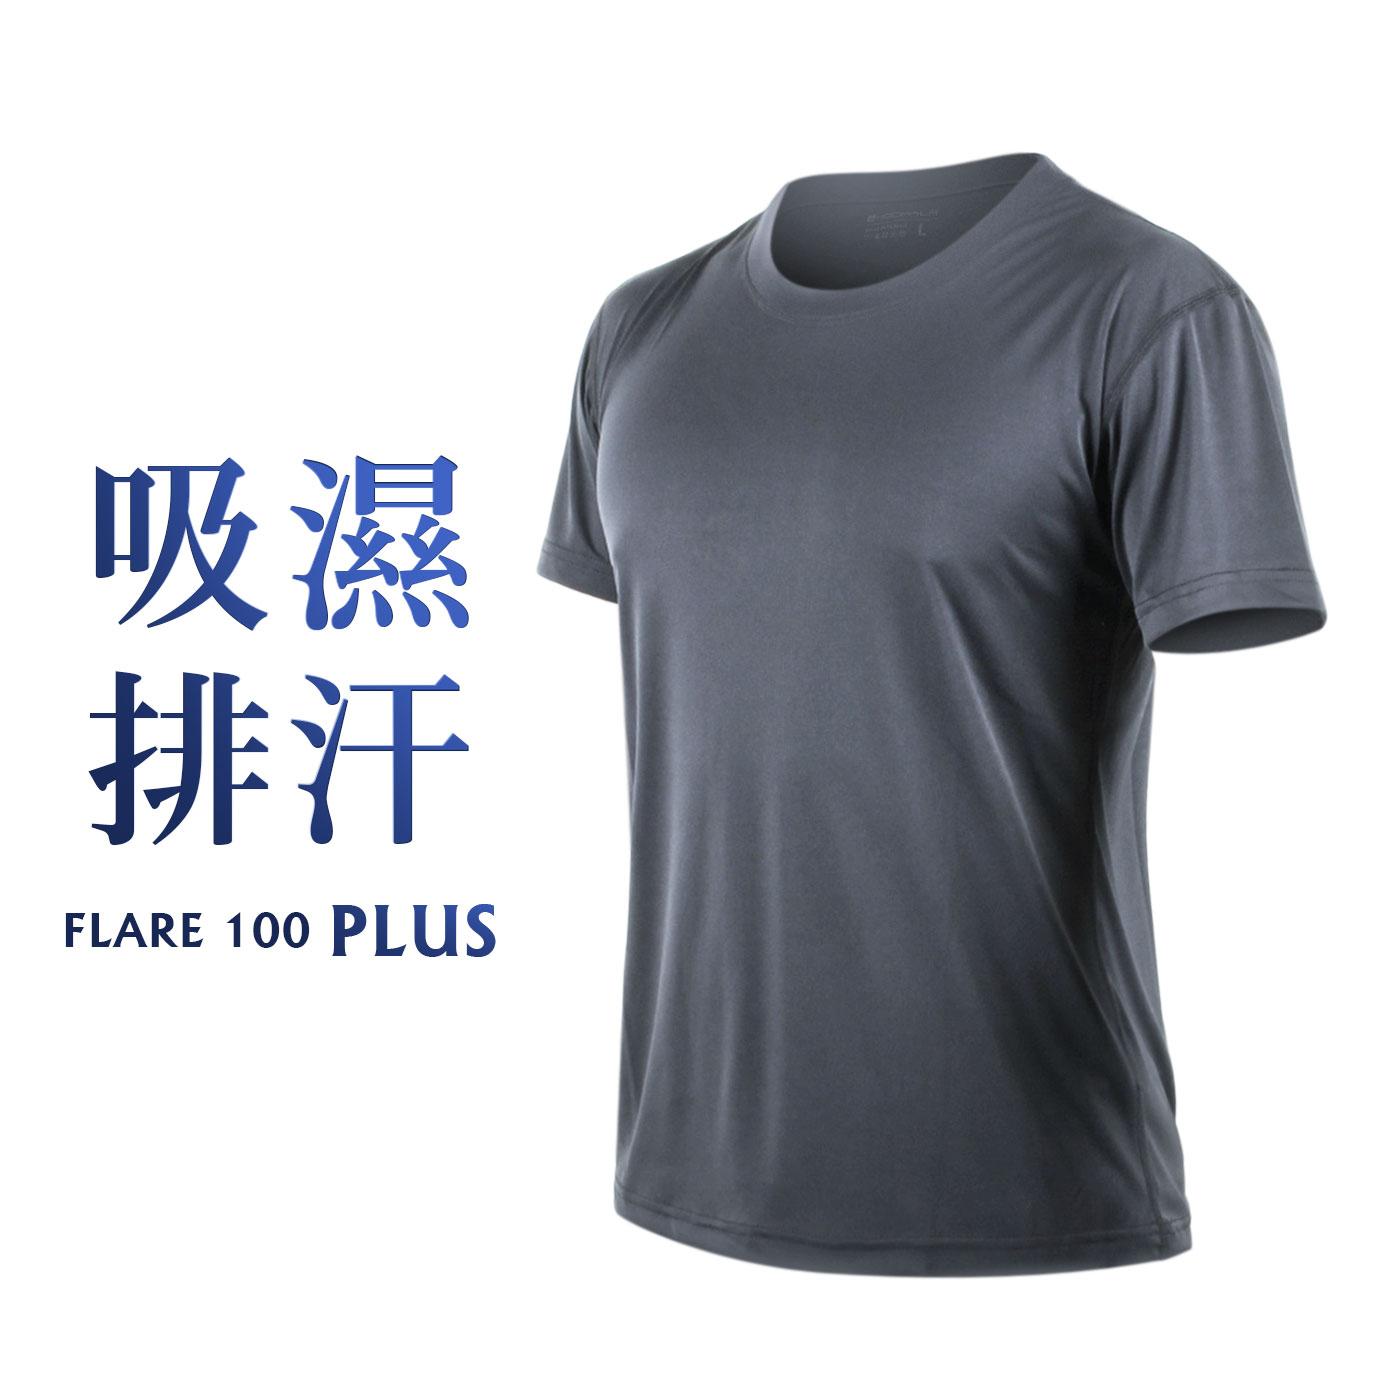 HODARLA FLARE 100 PLUS 吸濕排汗衫 3153701 - 鐵灰